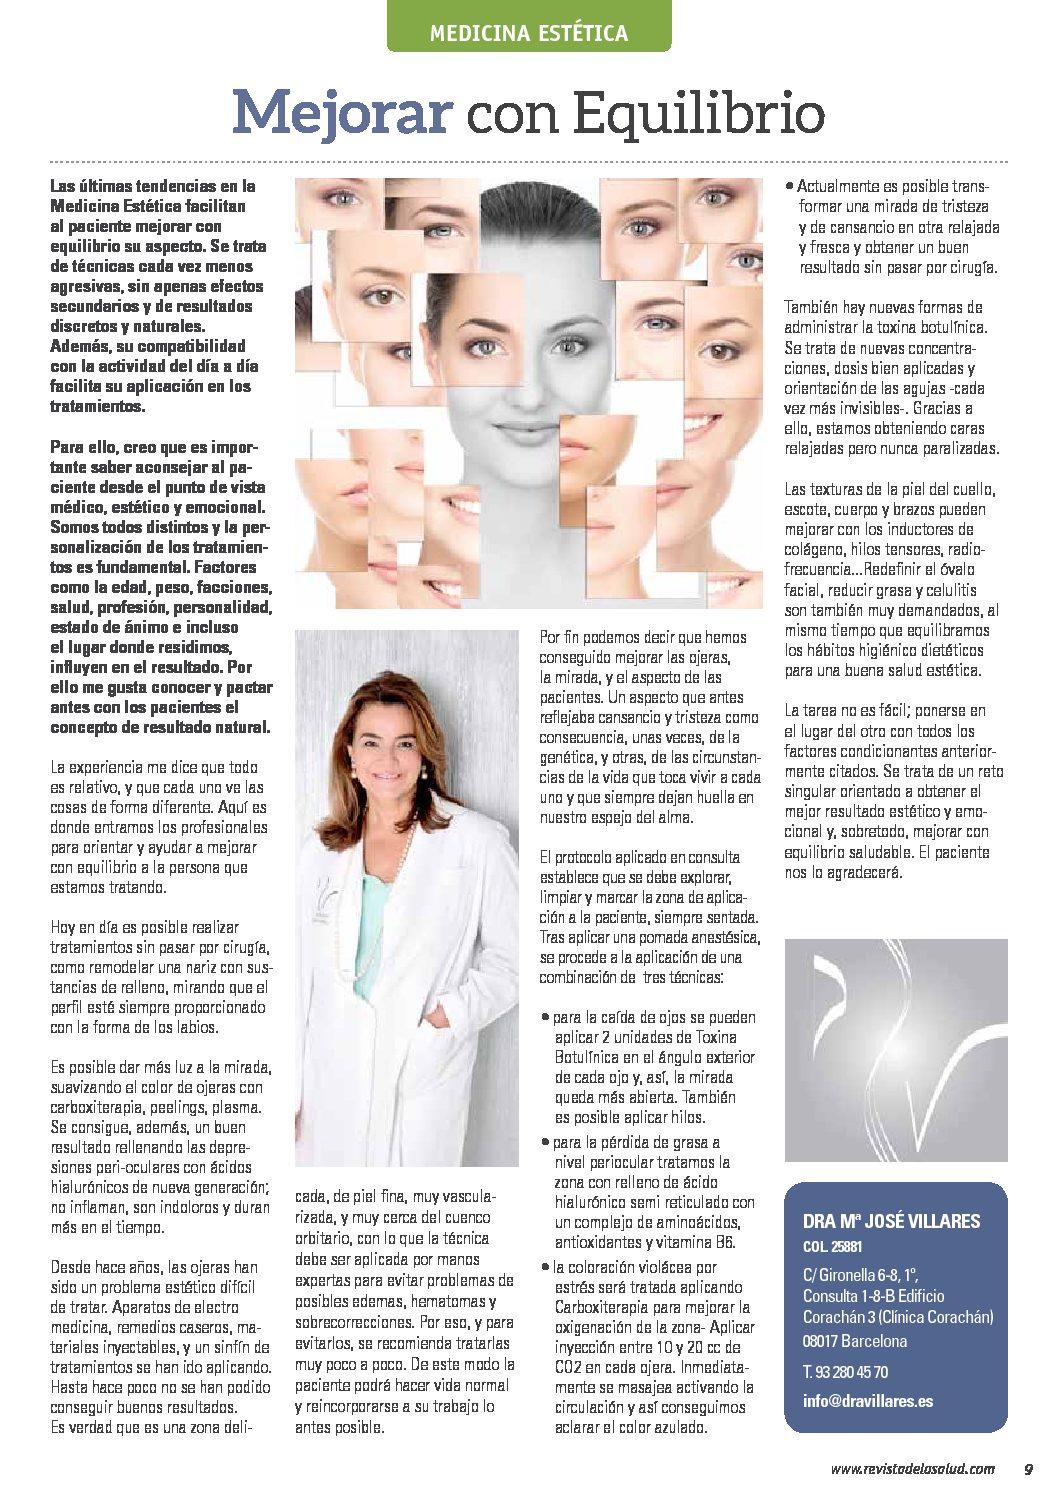 Articulo Dra Villares Revista de la Salud 2.0   2º Trimestre 2019